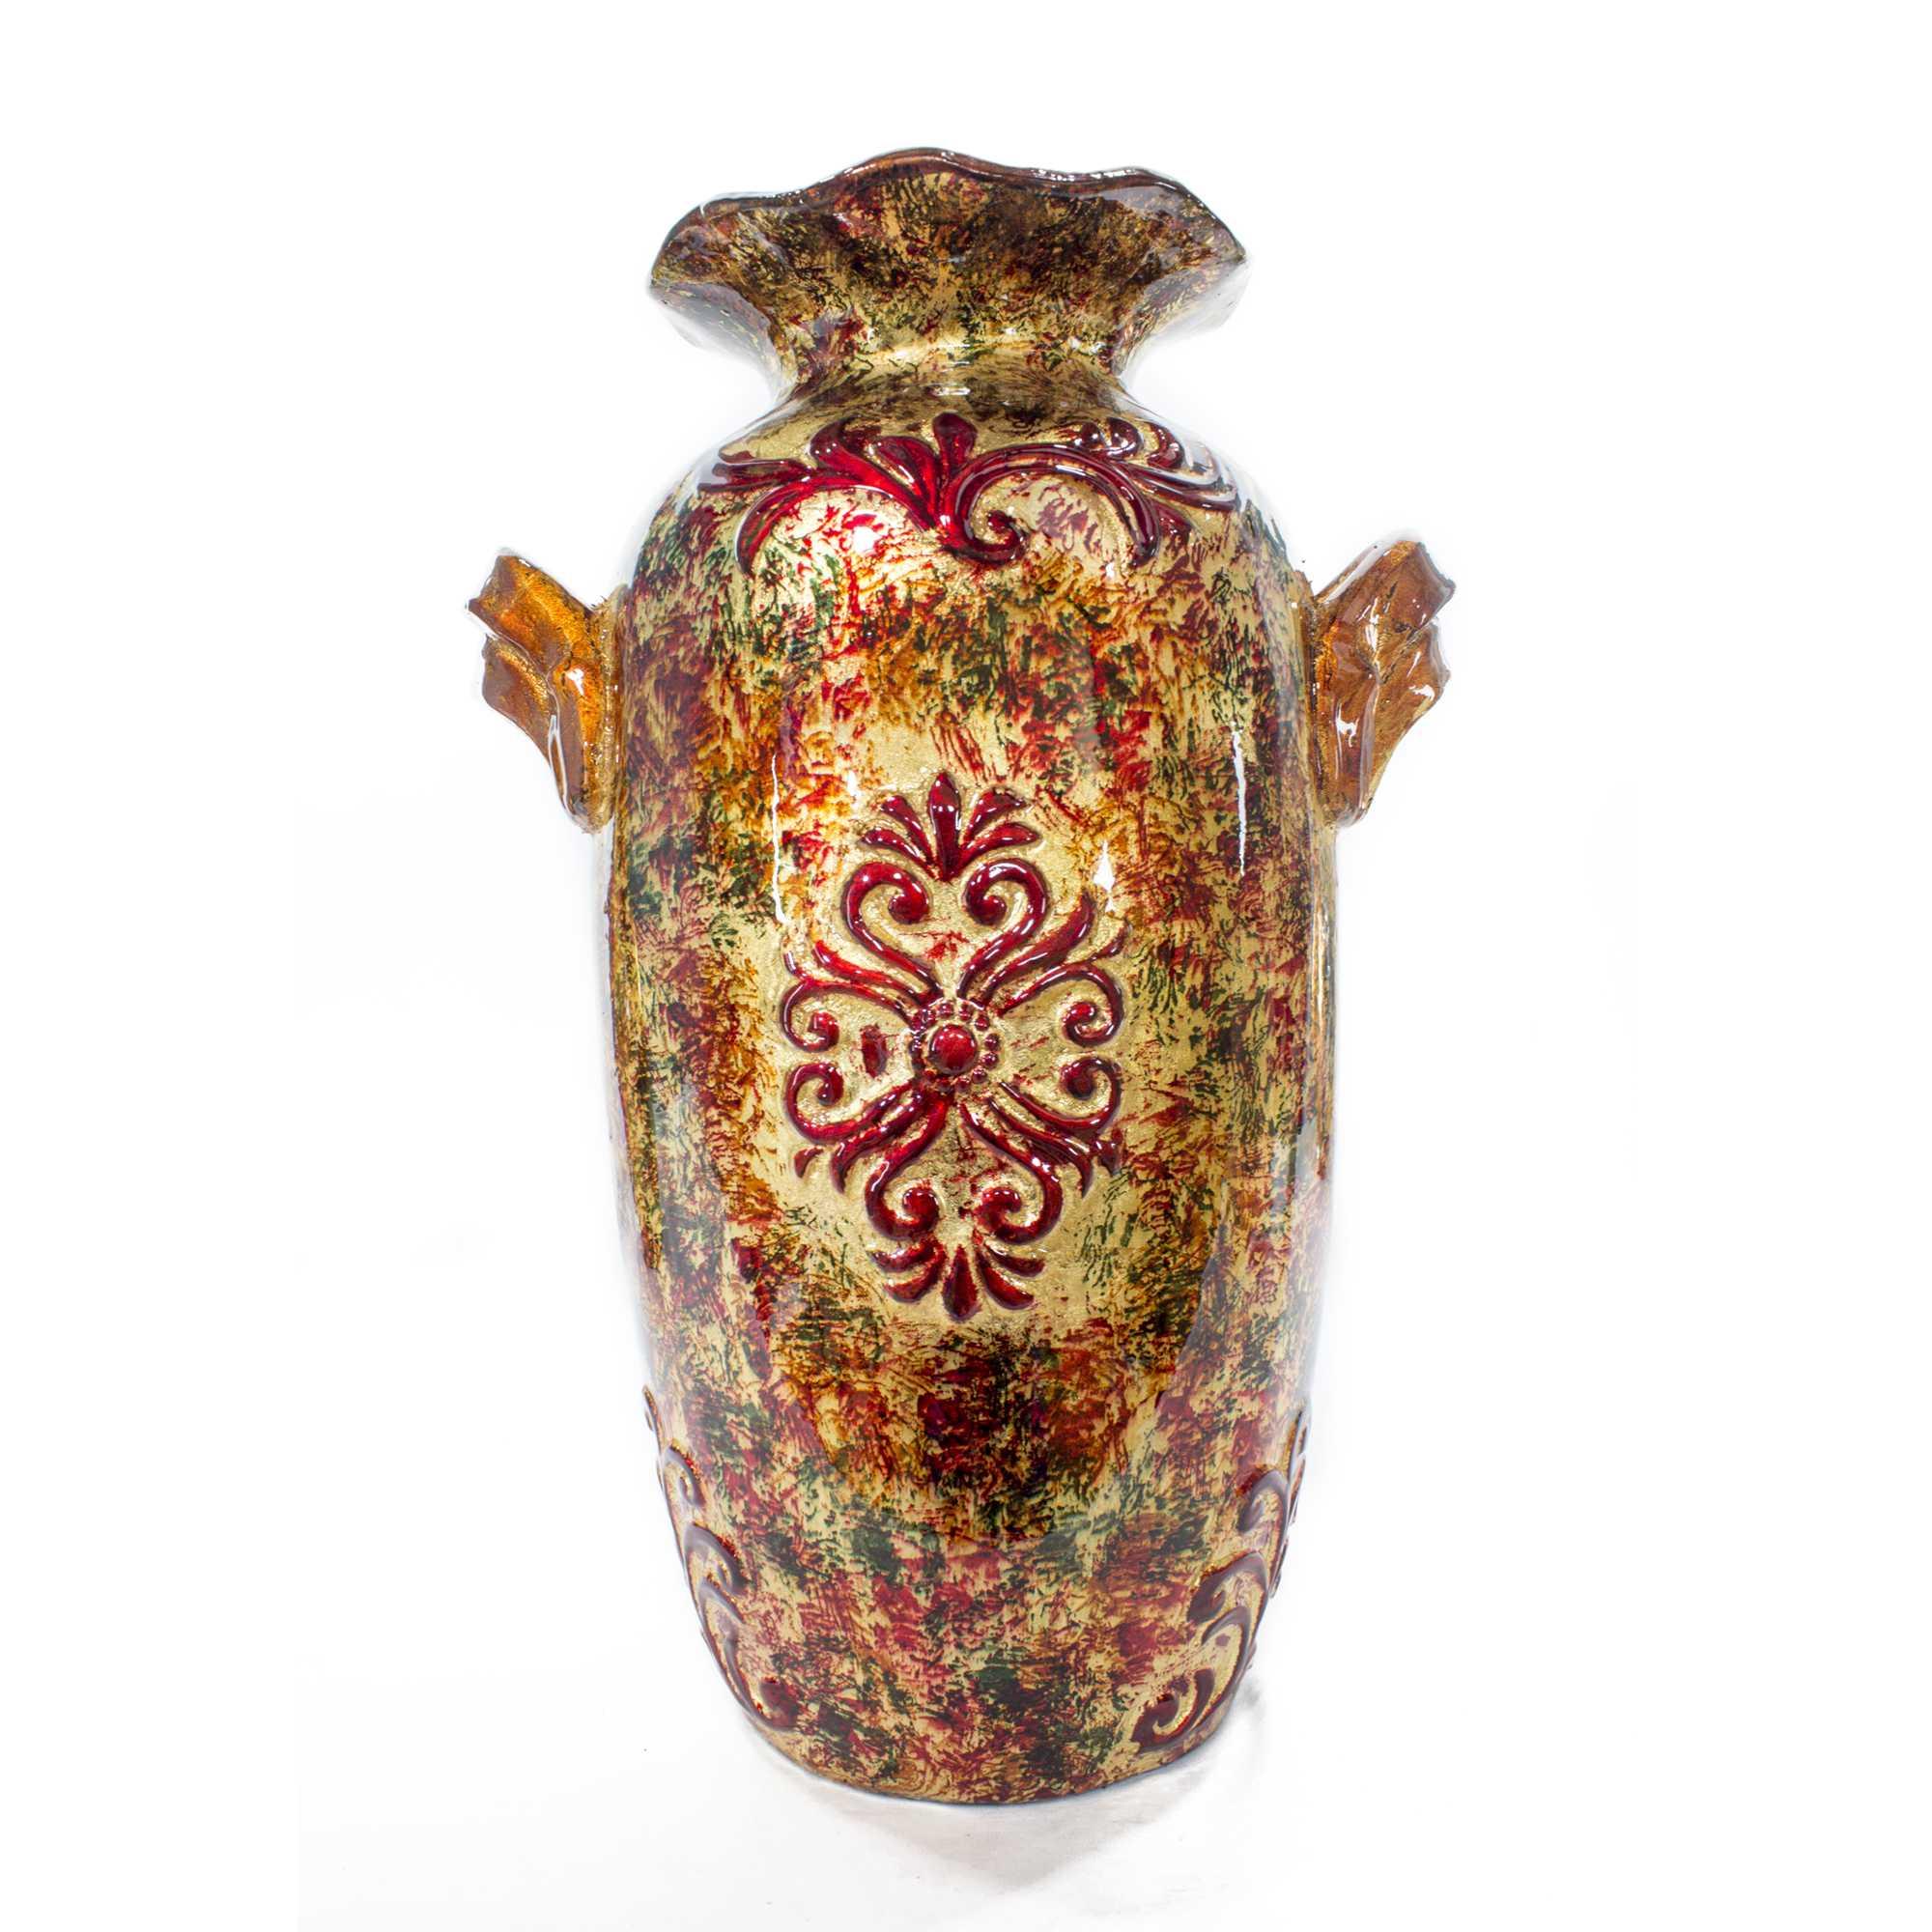 Rea Brown Orange Red Green Ceramic Foil and Lacquer Ruffle Vase